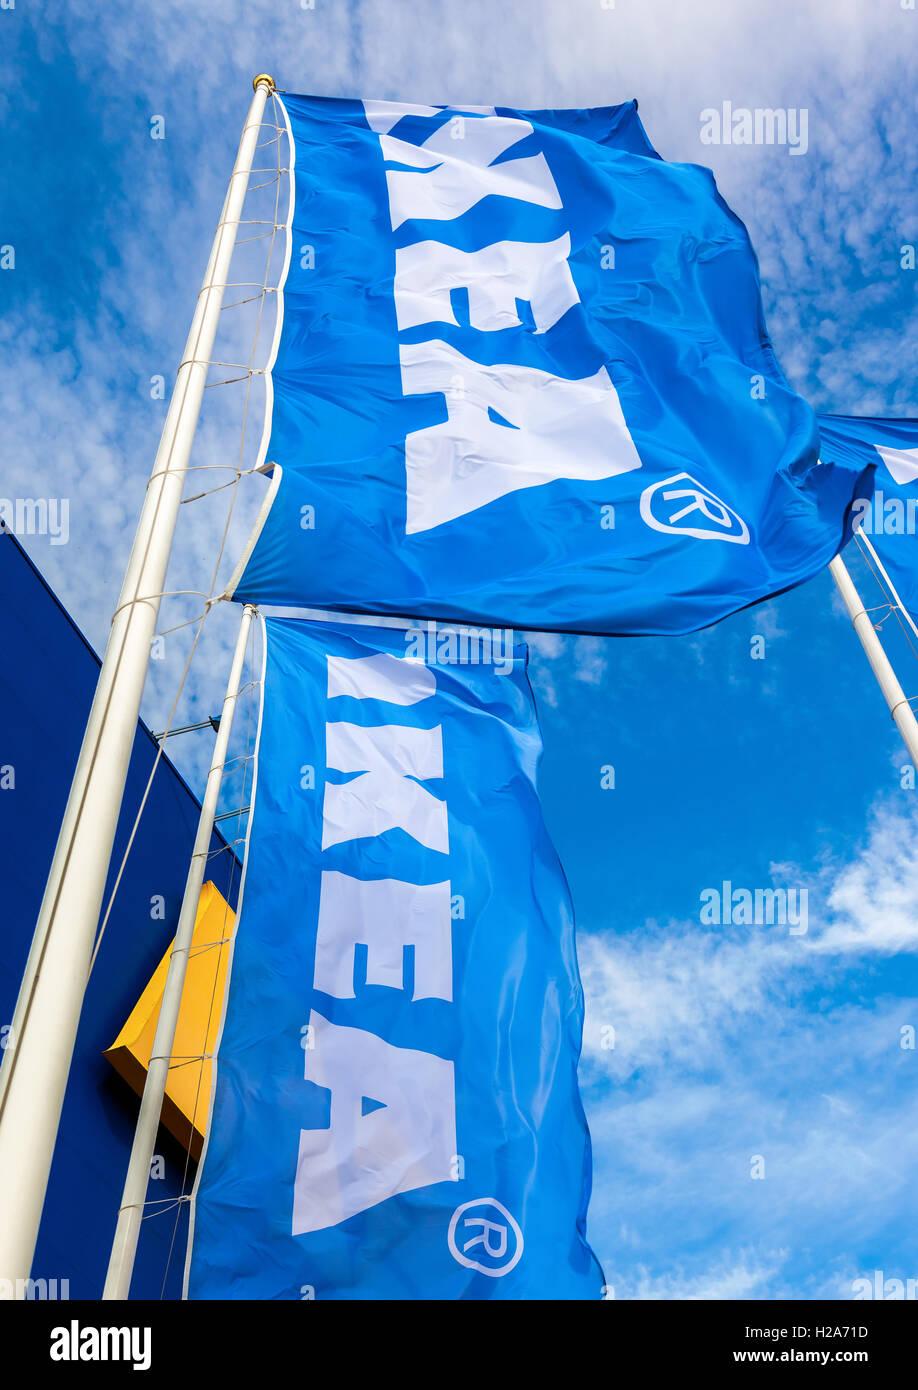 IKEA flags against a blue sky near the IKEA Samara Store - Stock Image